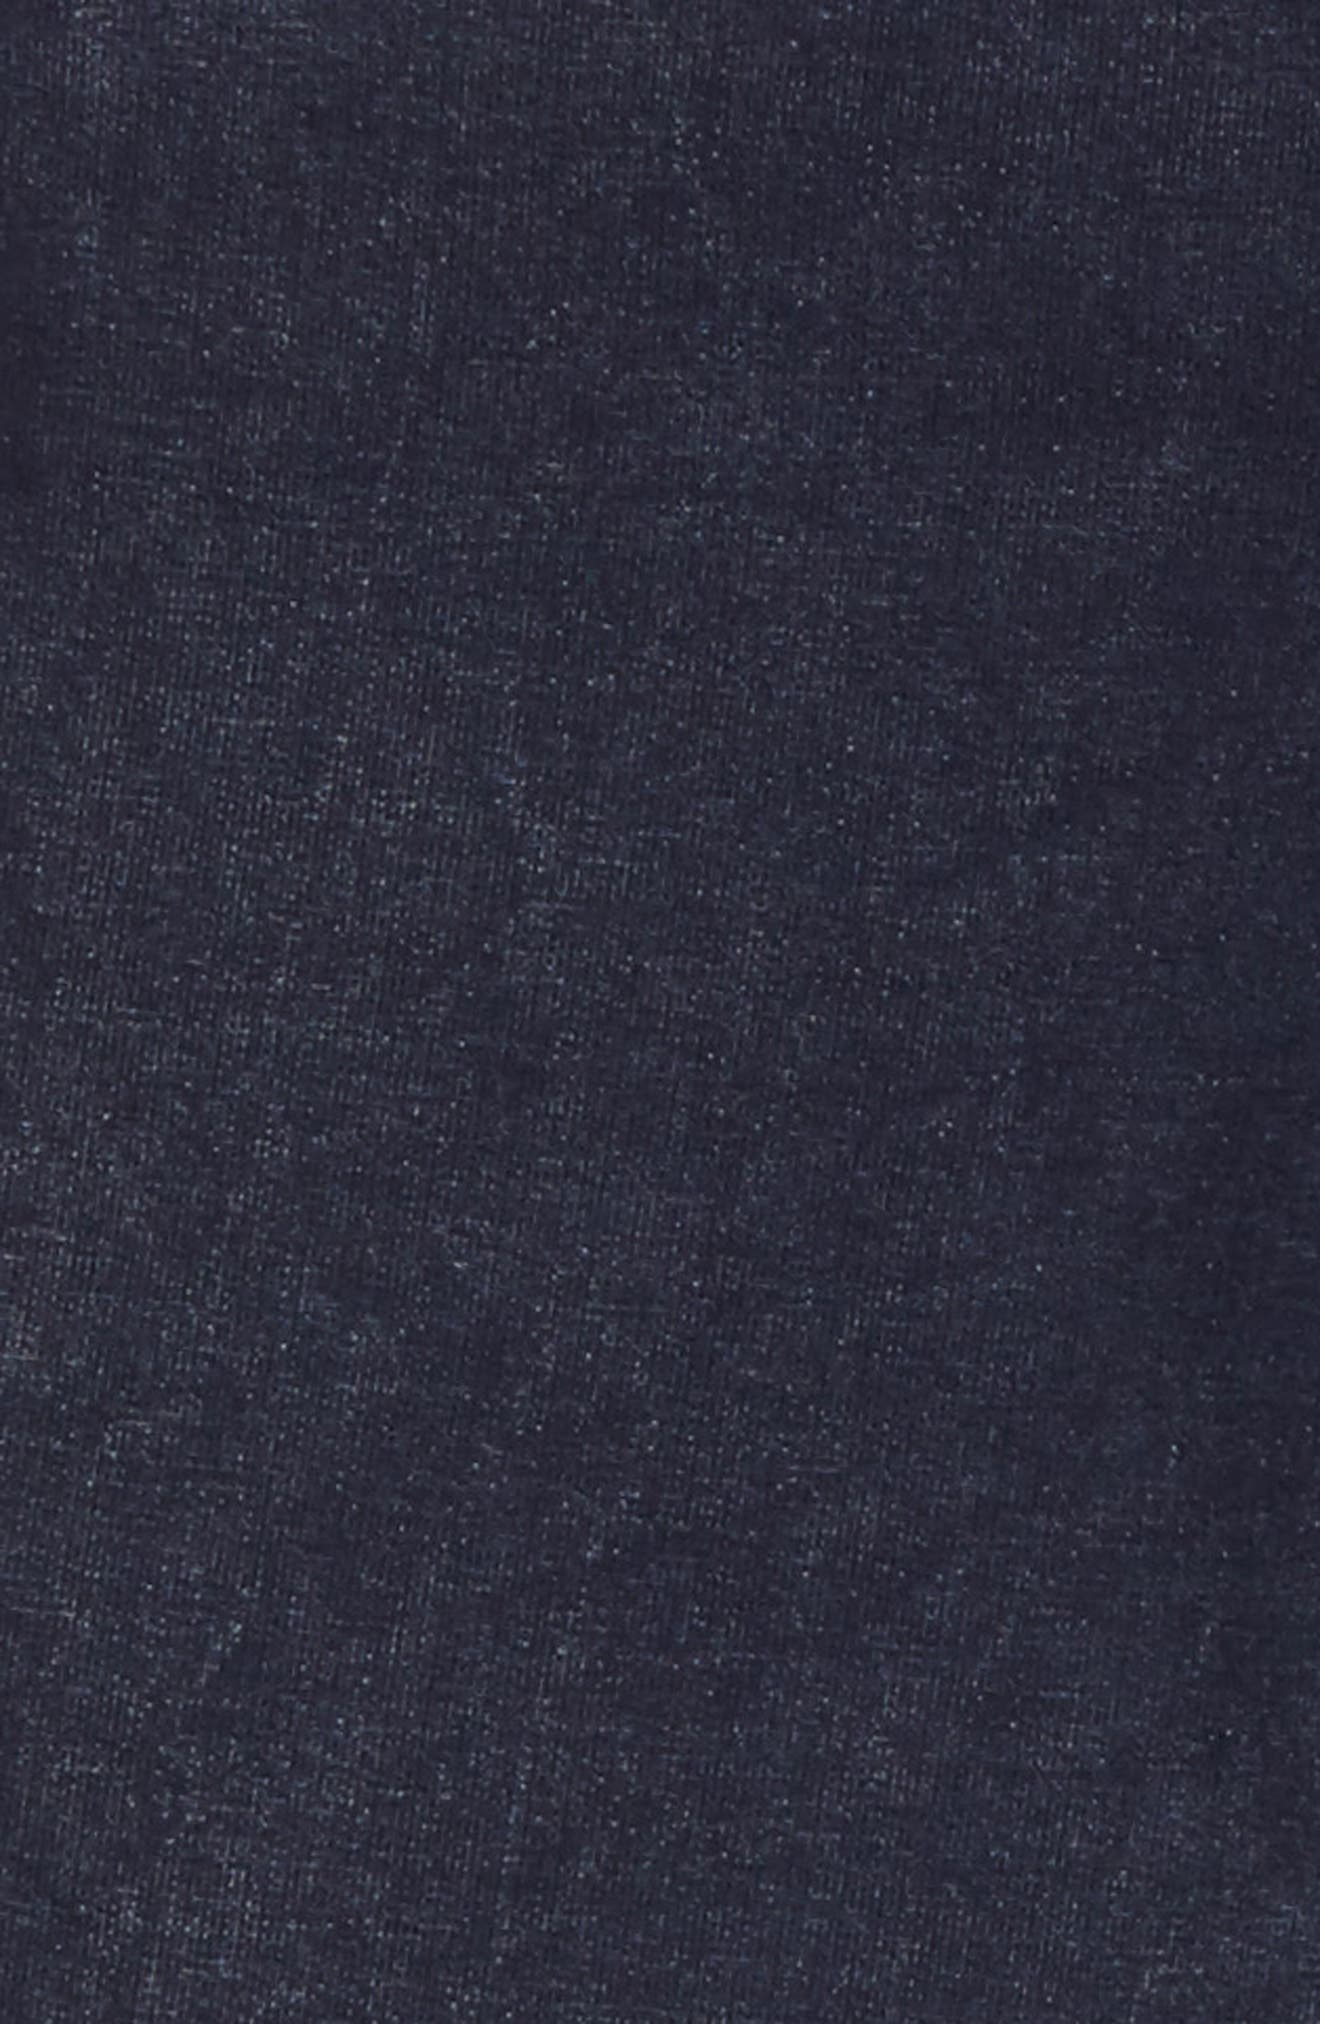 'Sadie' Jeggings,                             Alternate thumbnail 4, color,                             Dark Indigo Wash